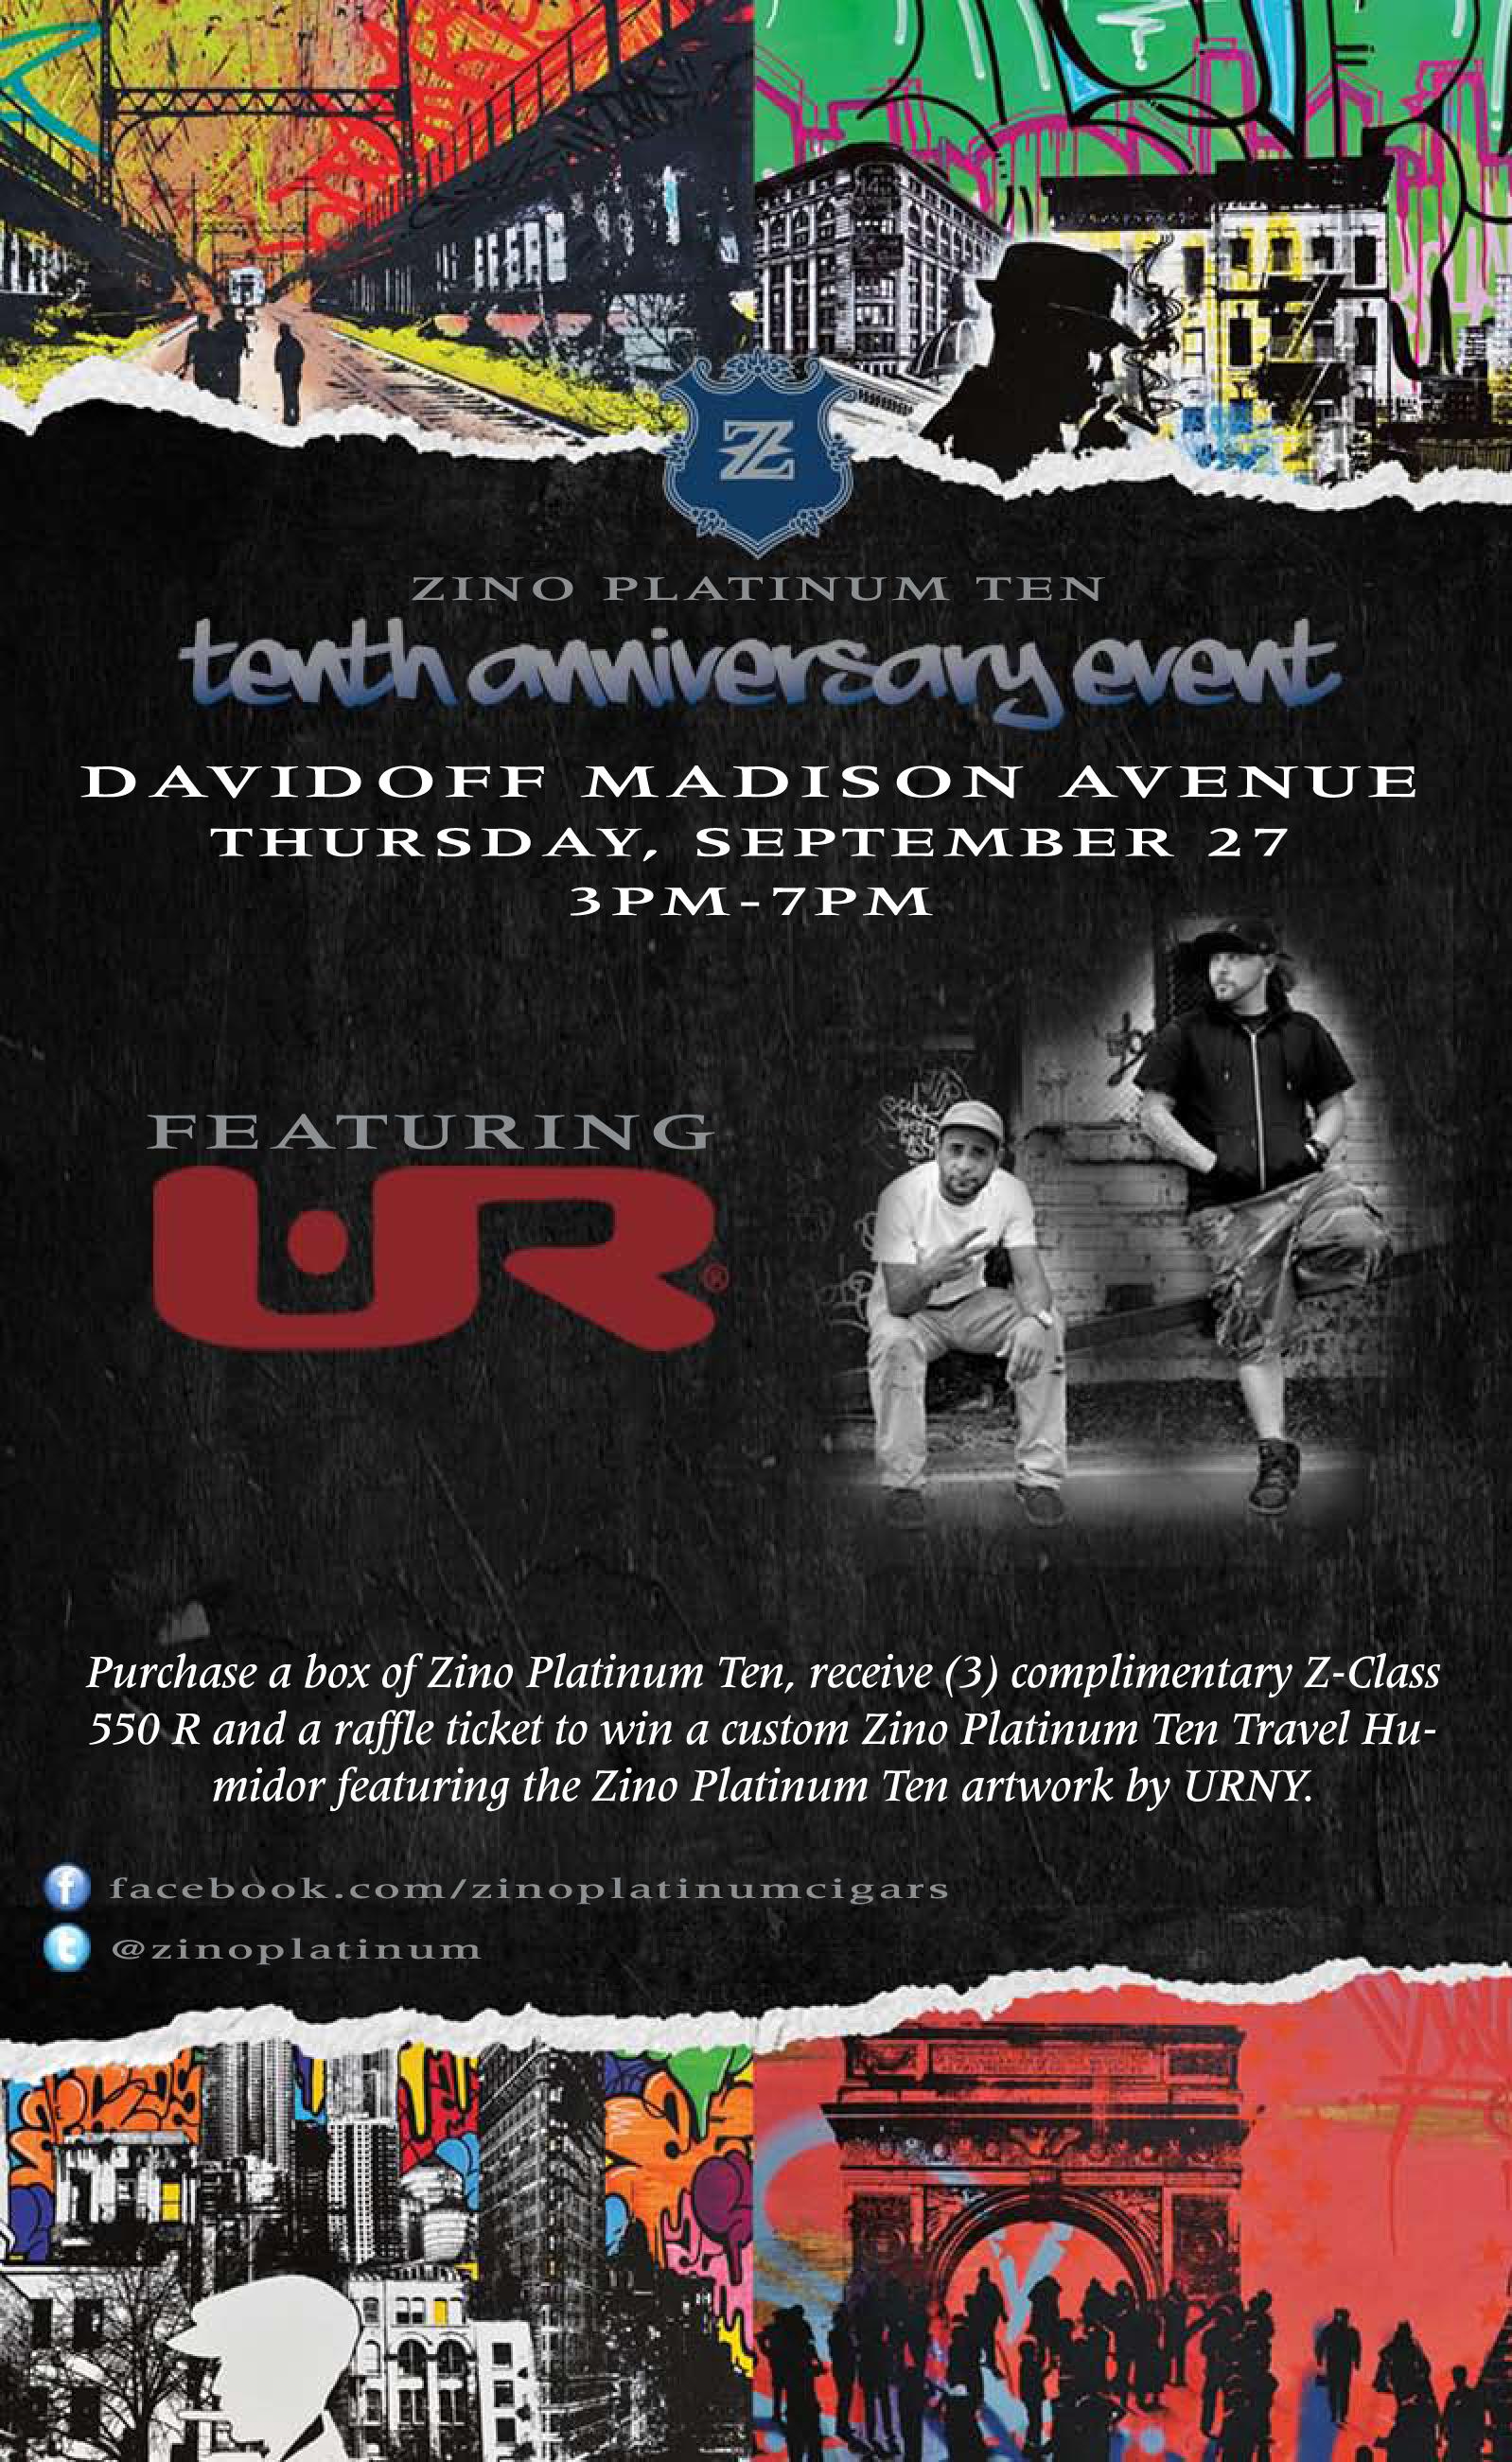 Zino Platinum Event @ Davidoff Madison